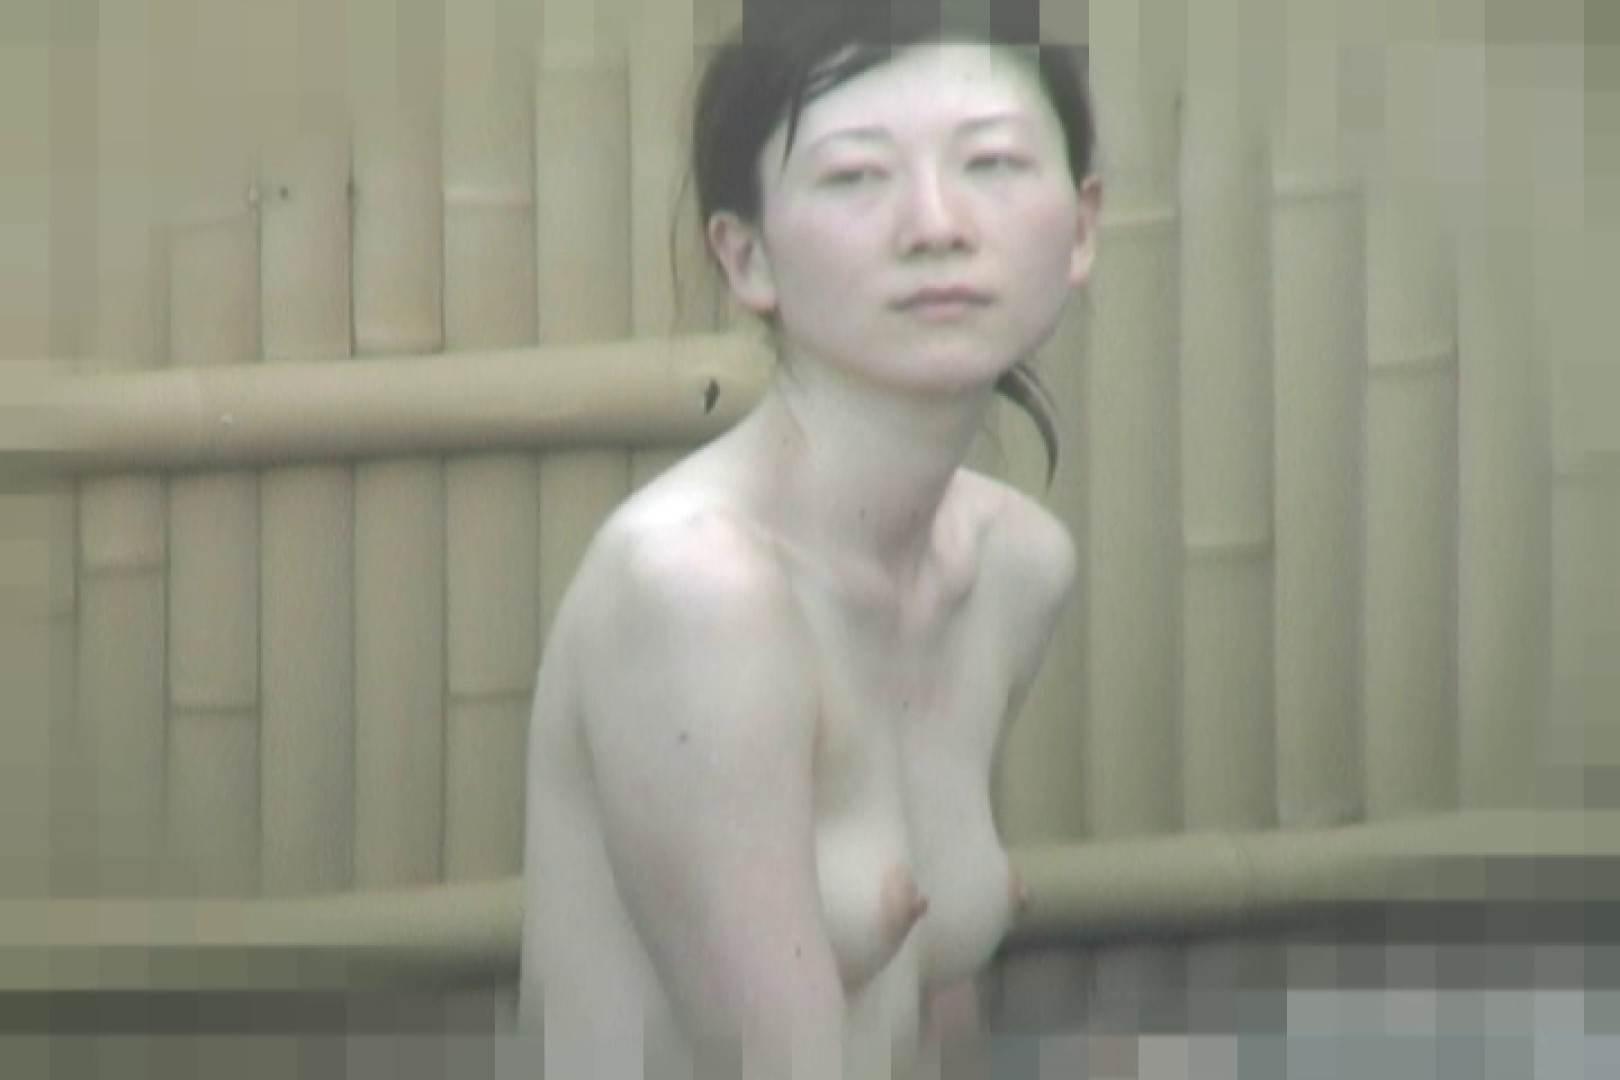 Aquaな露天風呂Vol.835 盗撮 | HなOL  73pic 63